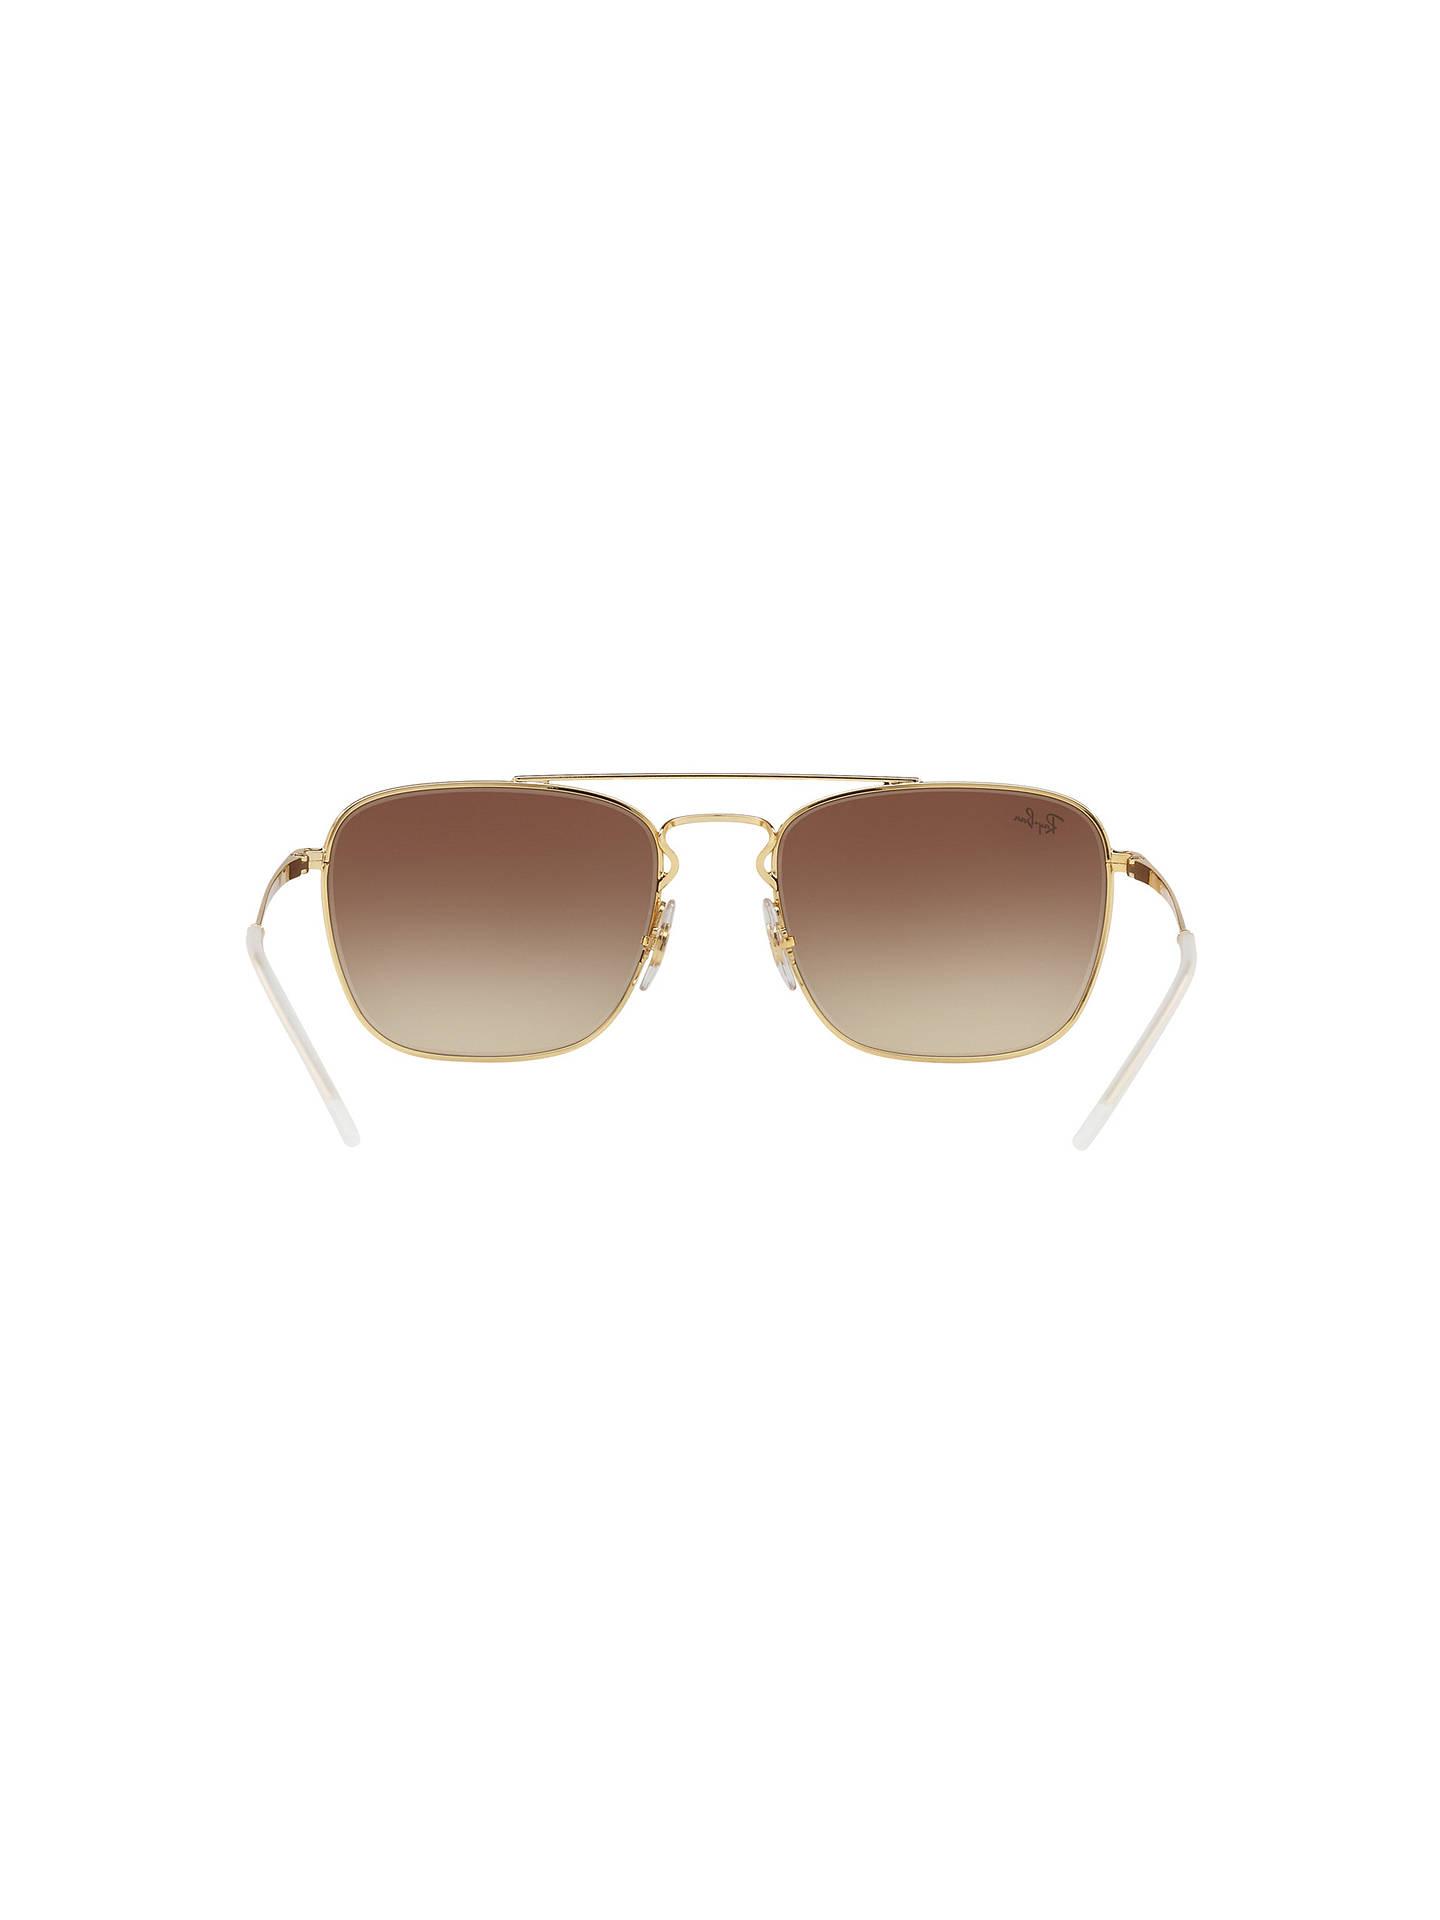 6c9b850082ed0 Ray-Ban RB3588 Men s Square Sunglasses at John Lewis   Partners